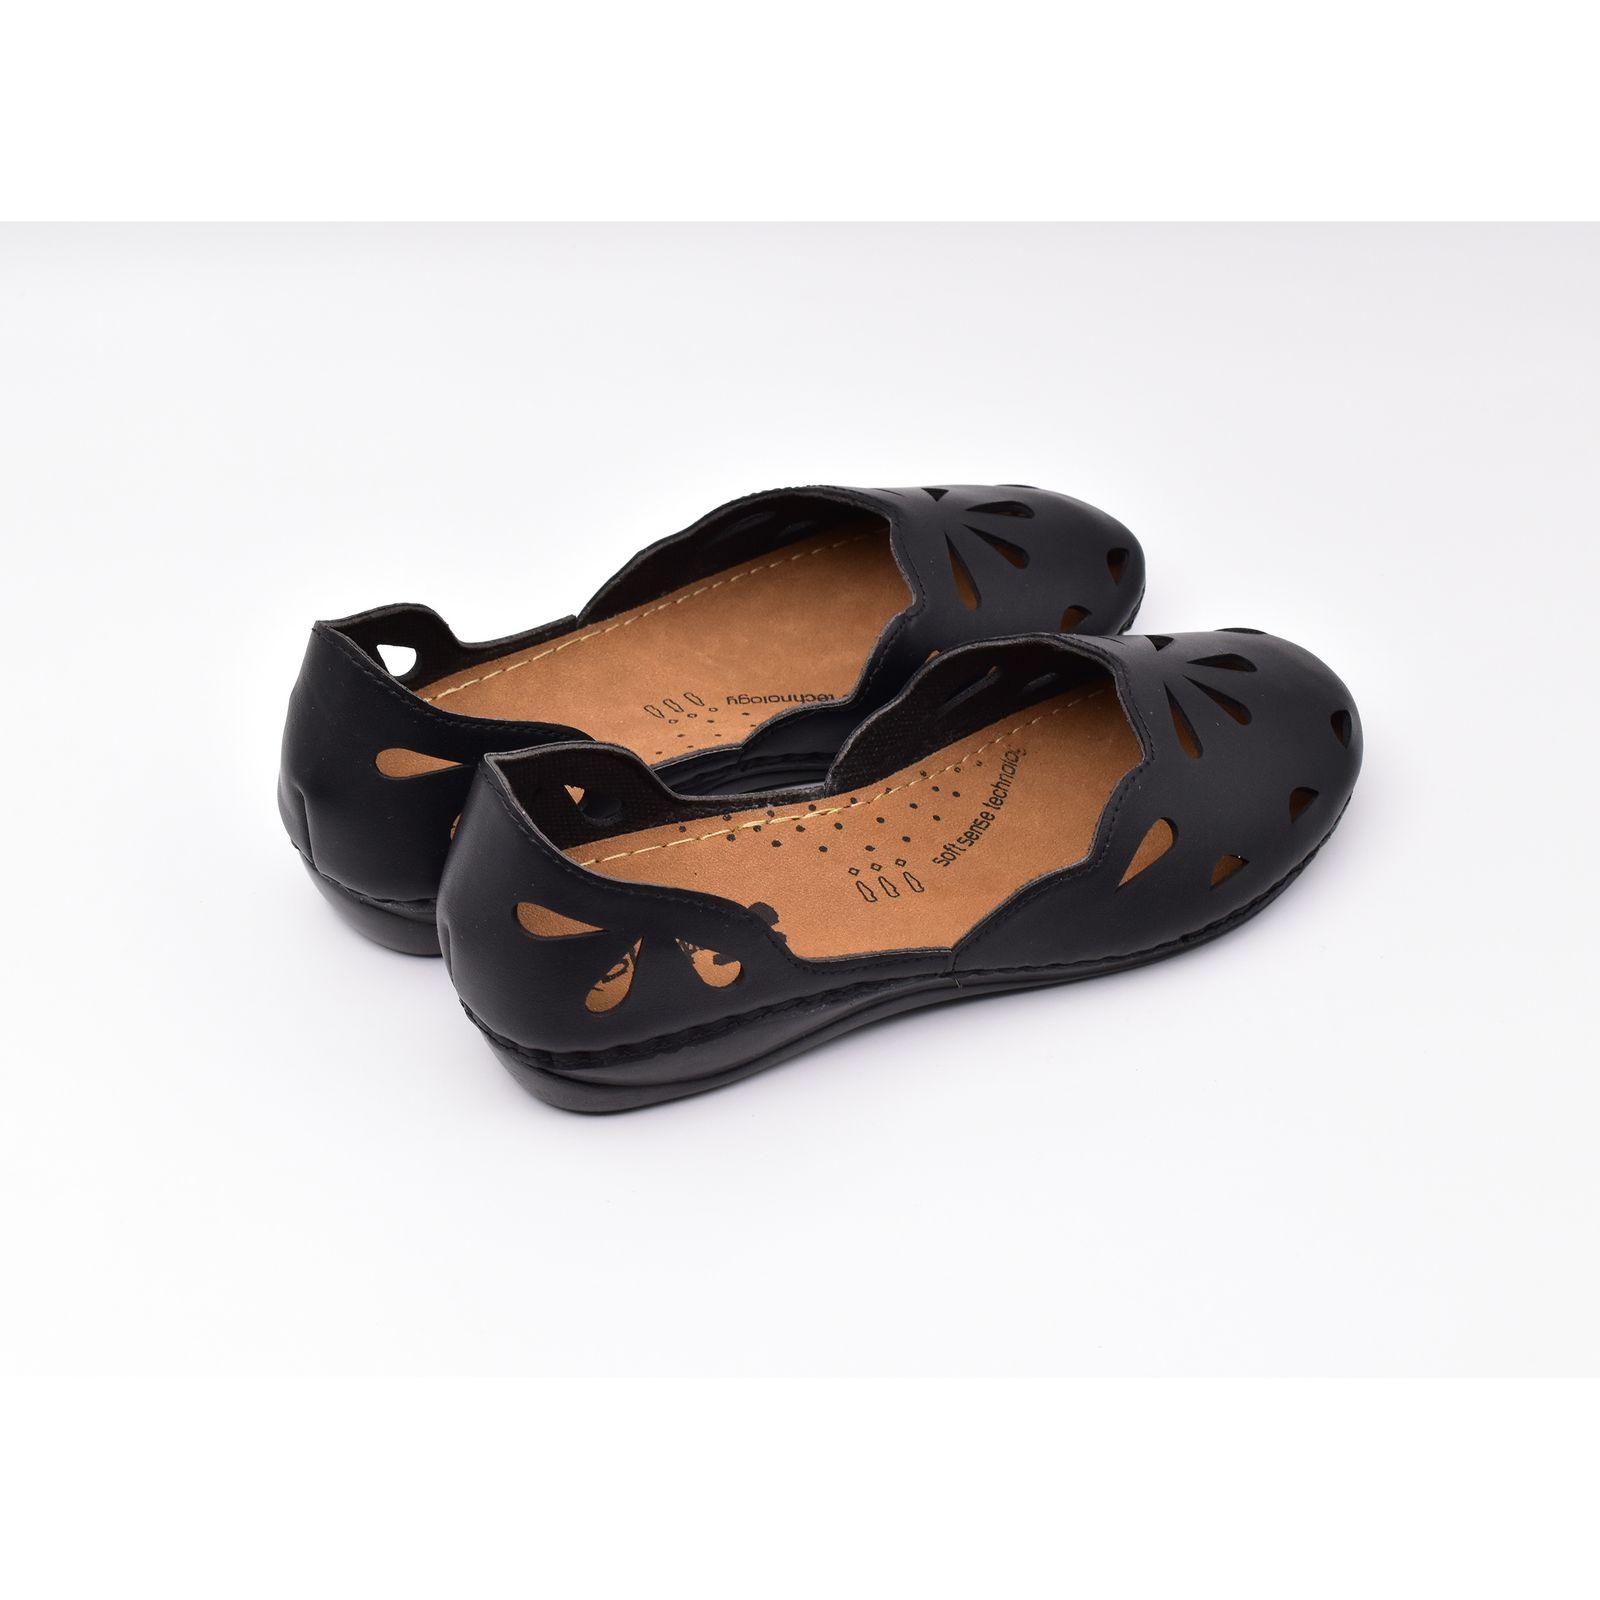 کفش زنانه شهپر مدل رویا 109 کد 7187 -  - 5